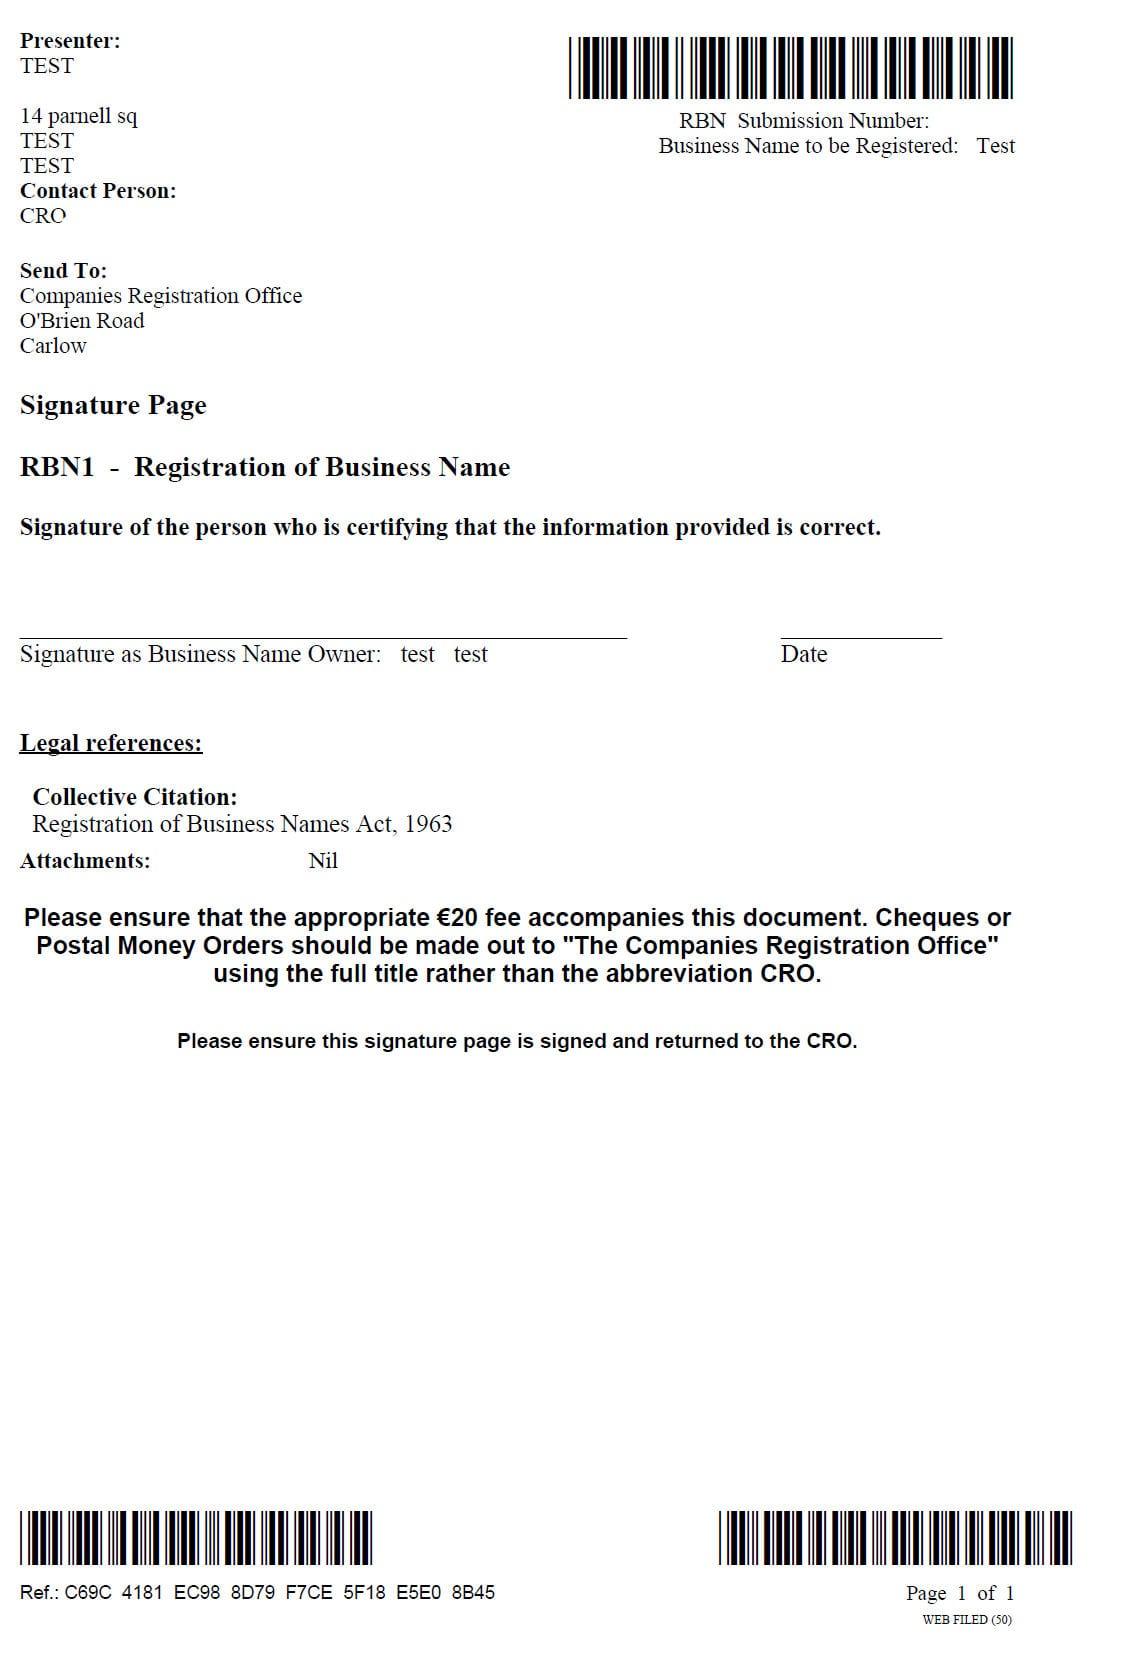 Illinois Business Registration Application Business Registration Application Form Spreadsheet Templates for Busines Spreadsheet Templates for Busines Florida Business Registration Application